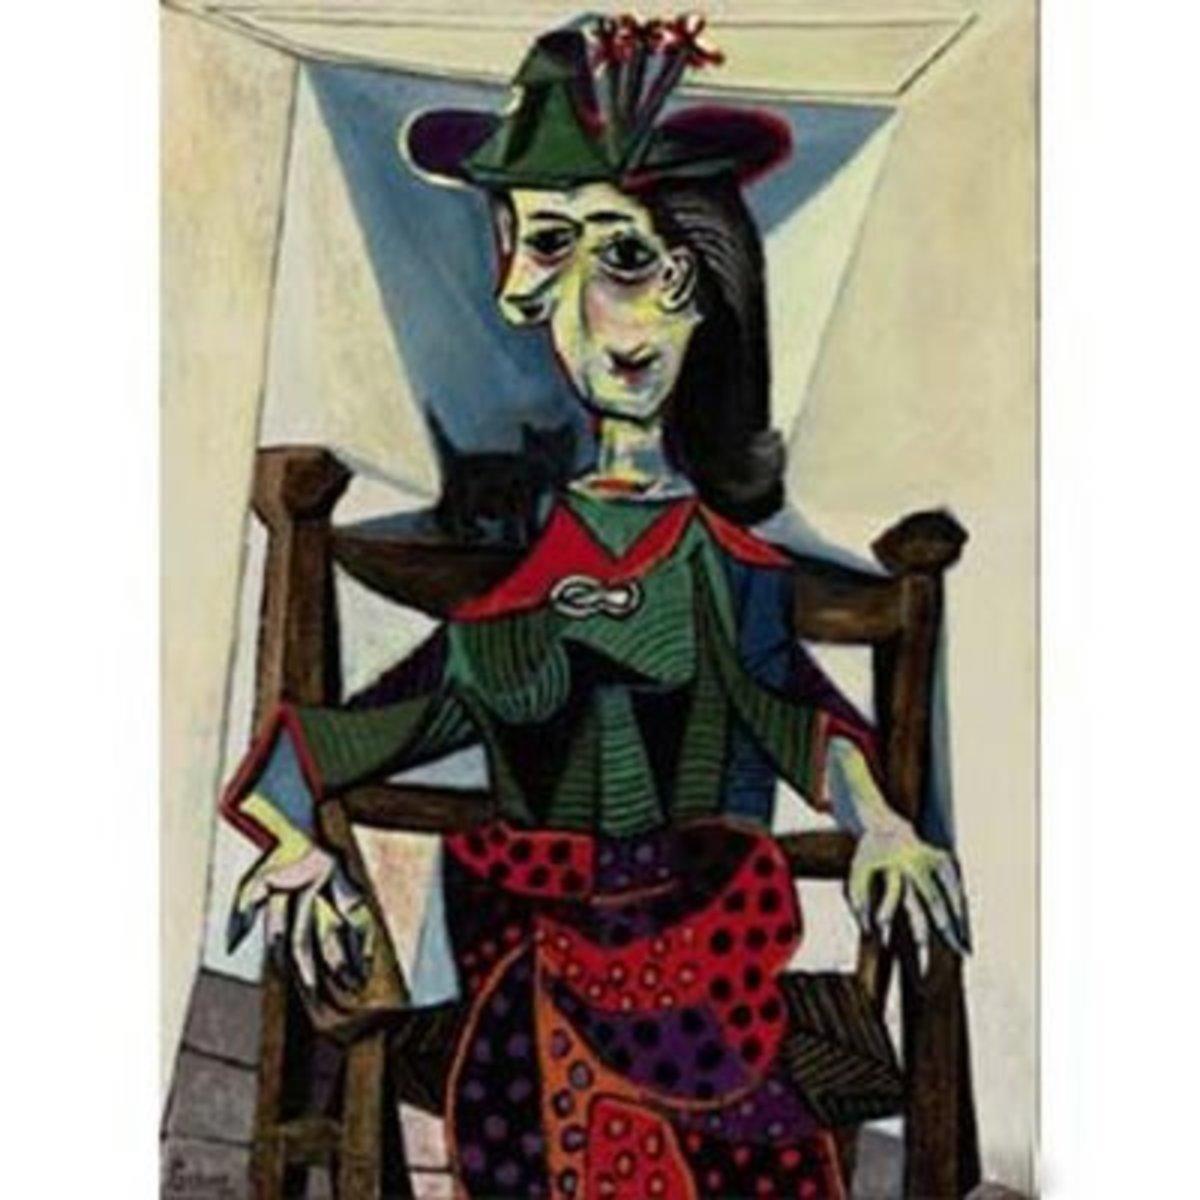 5. Pablo Picasso - Dora Maar au chat - $95,216,000